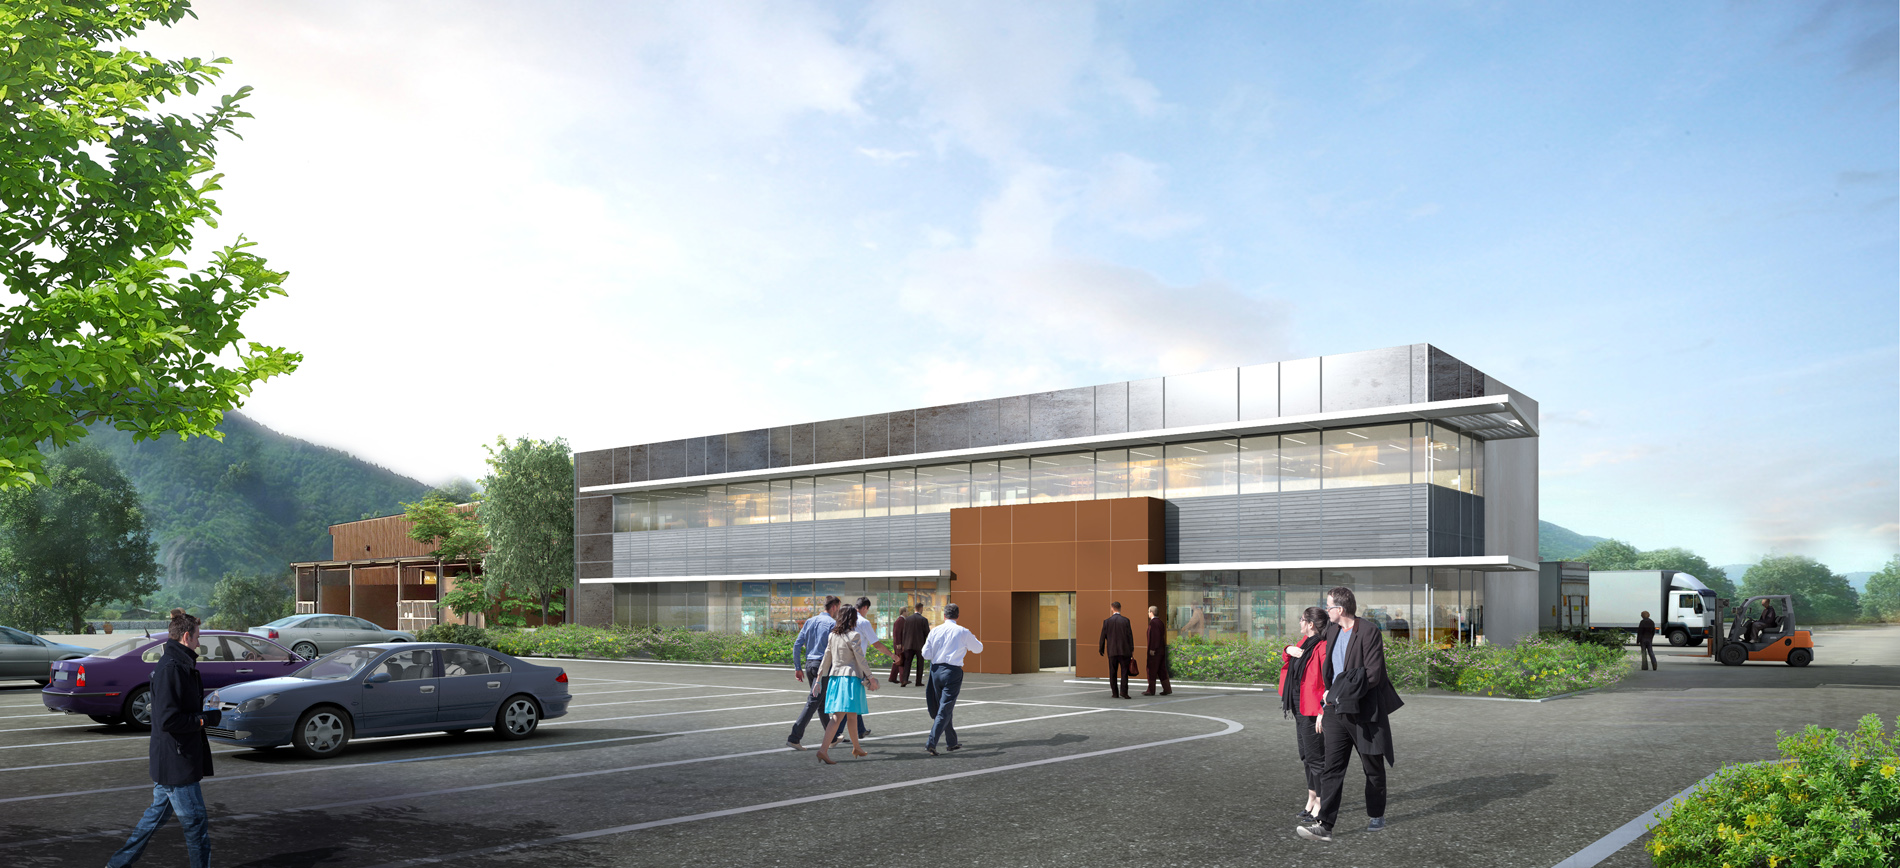 Perspectives architecture 3d grenoble lyon annecy for Architecte 3d 2018